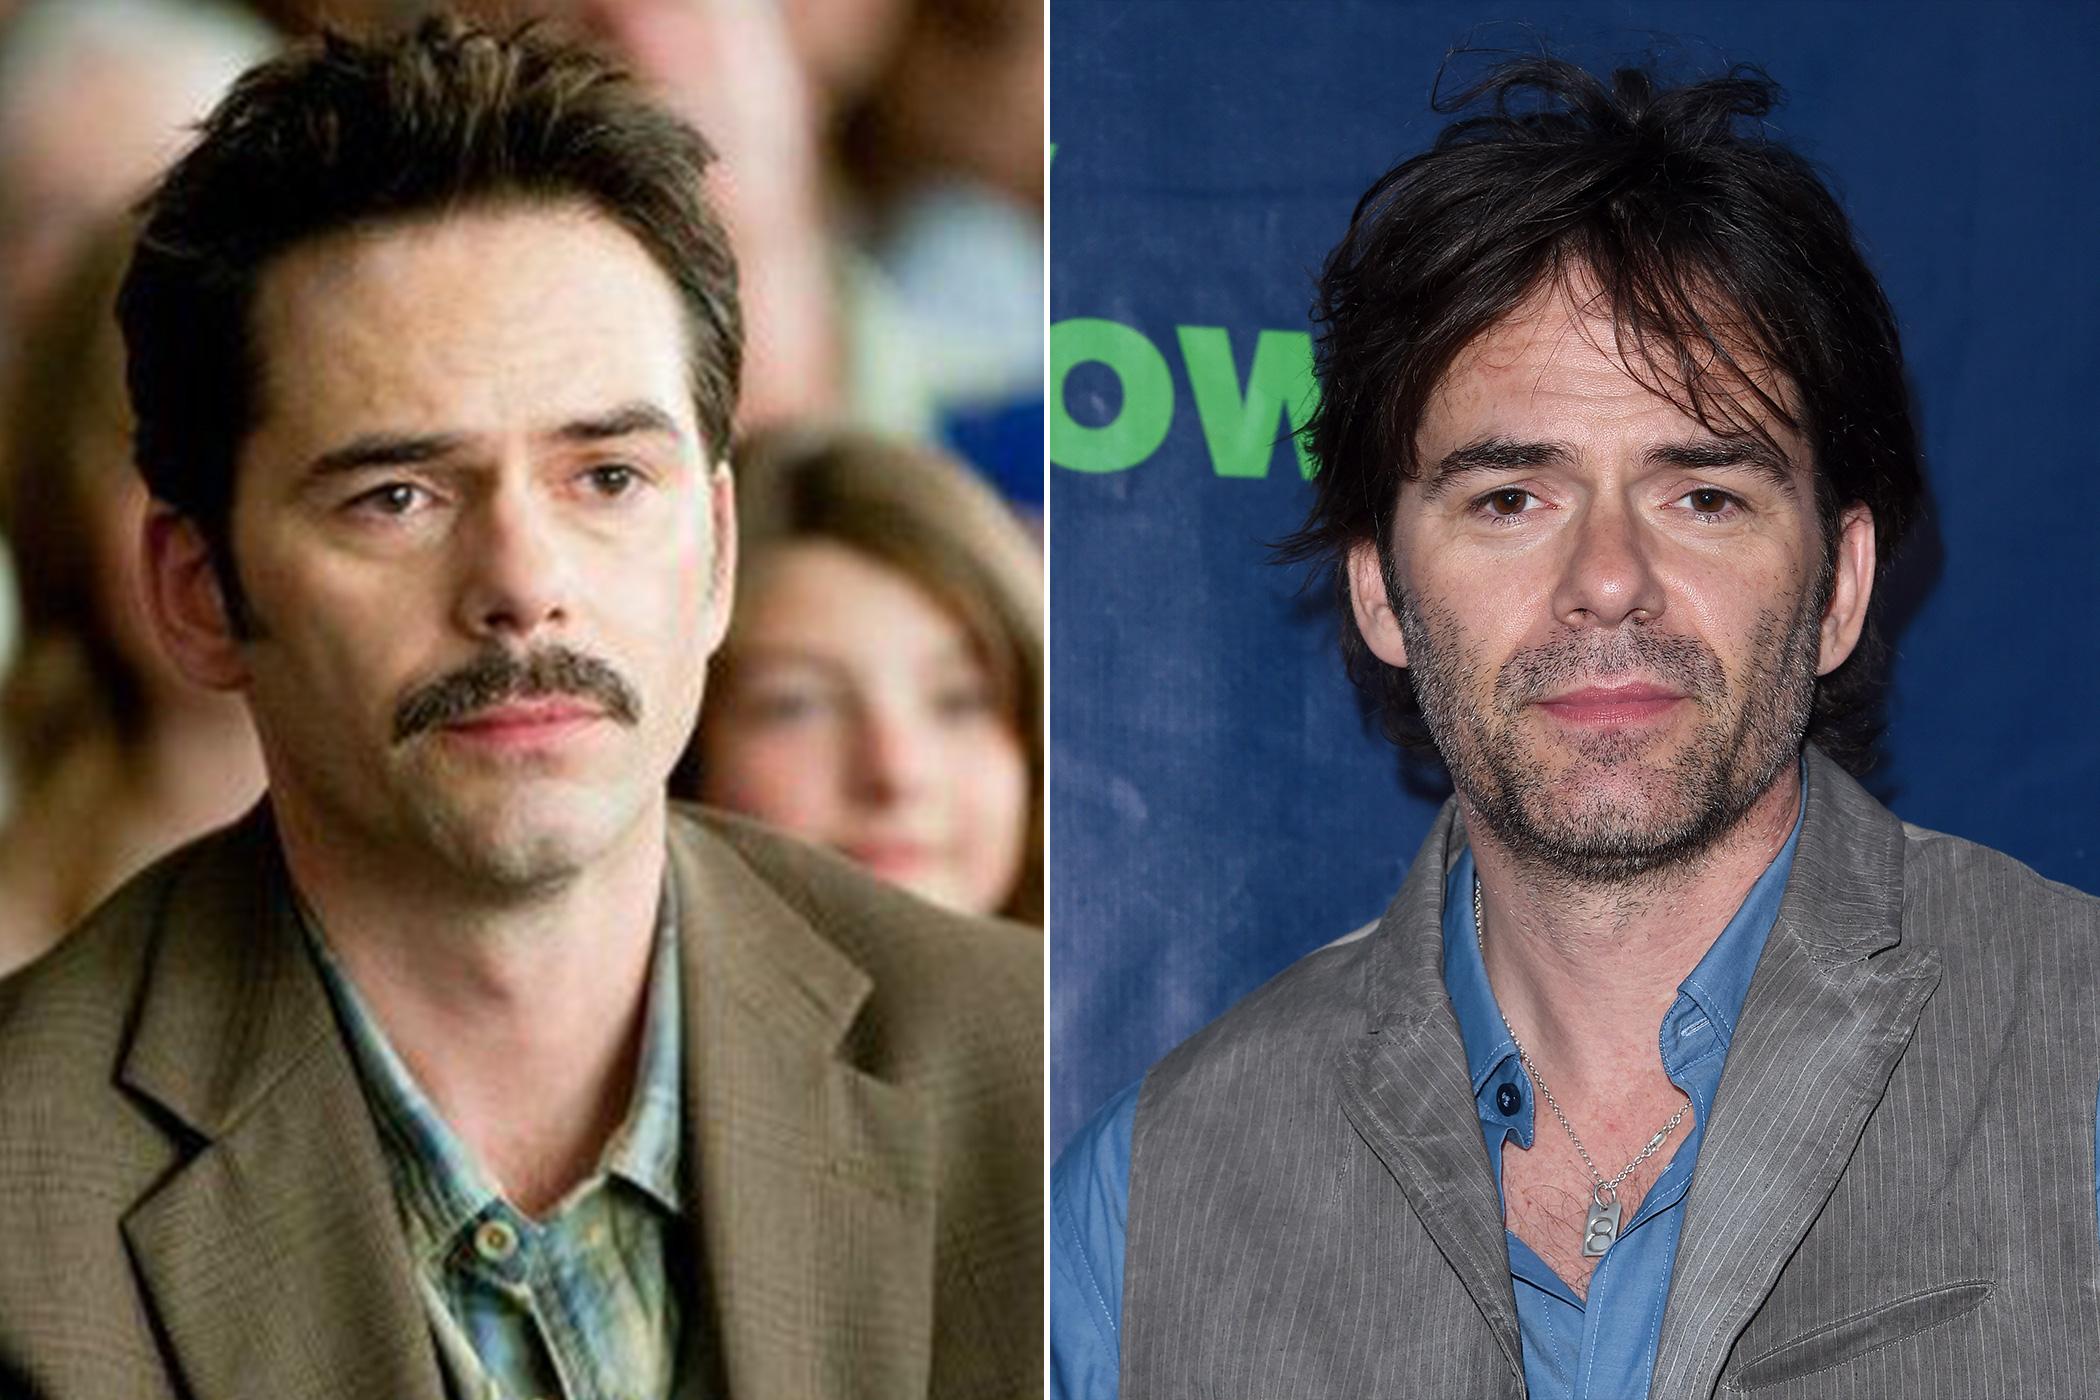 <i>Left</I>: Billy Burke as Charlie Swan in <i>The Twilight Saga: Eclipse</i>, 2010; <i>Right</i>: in 2015